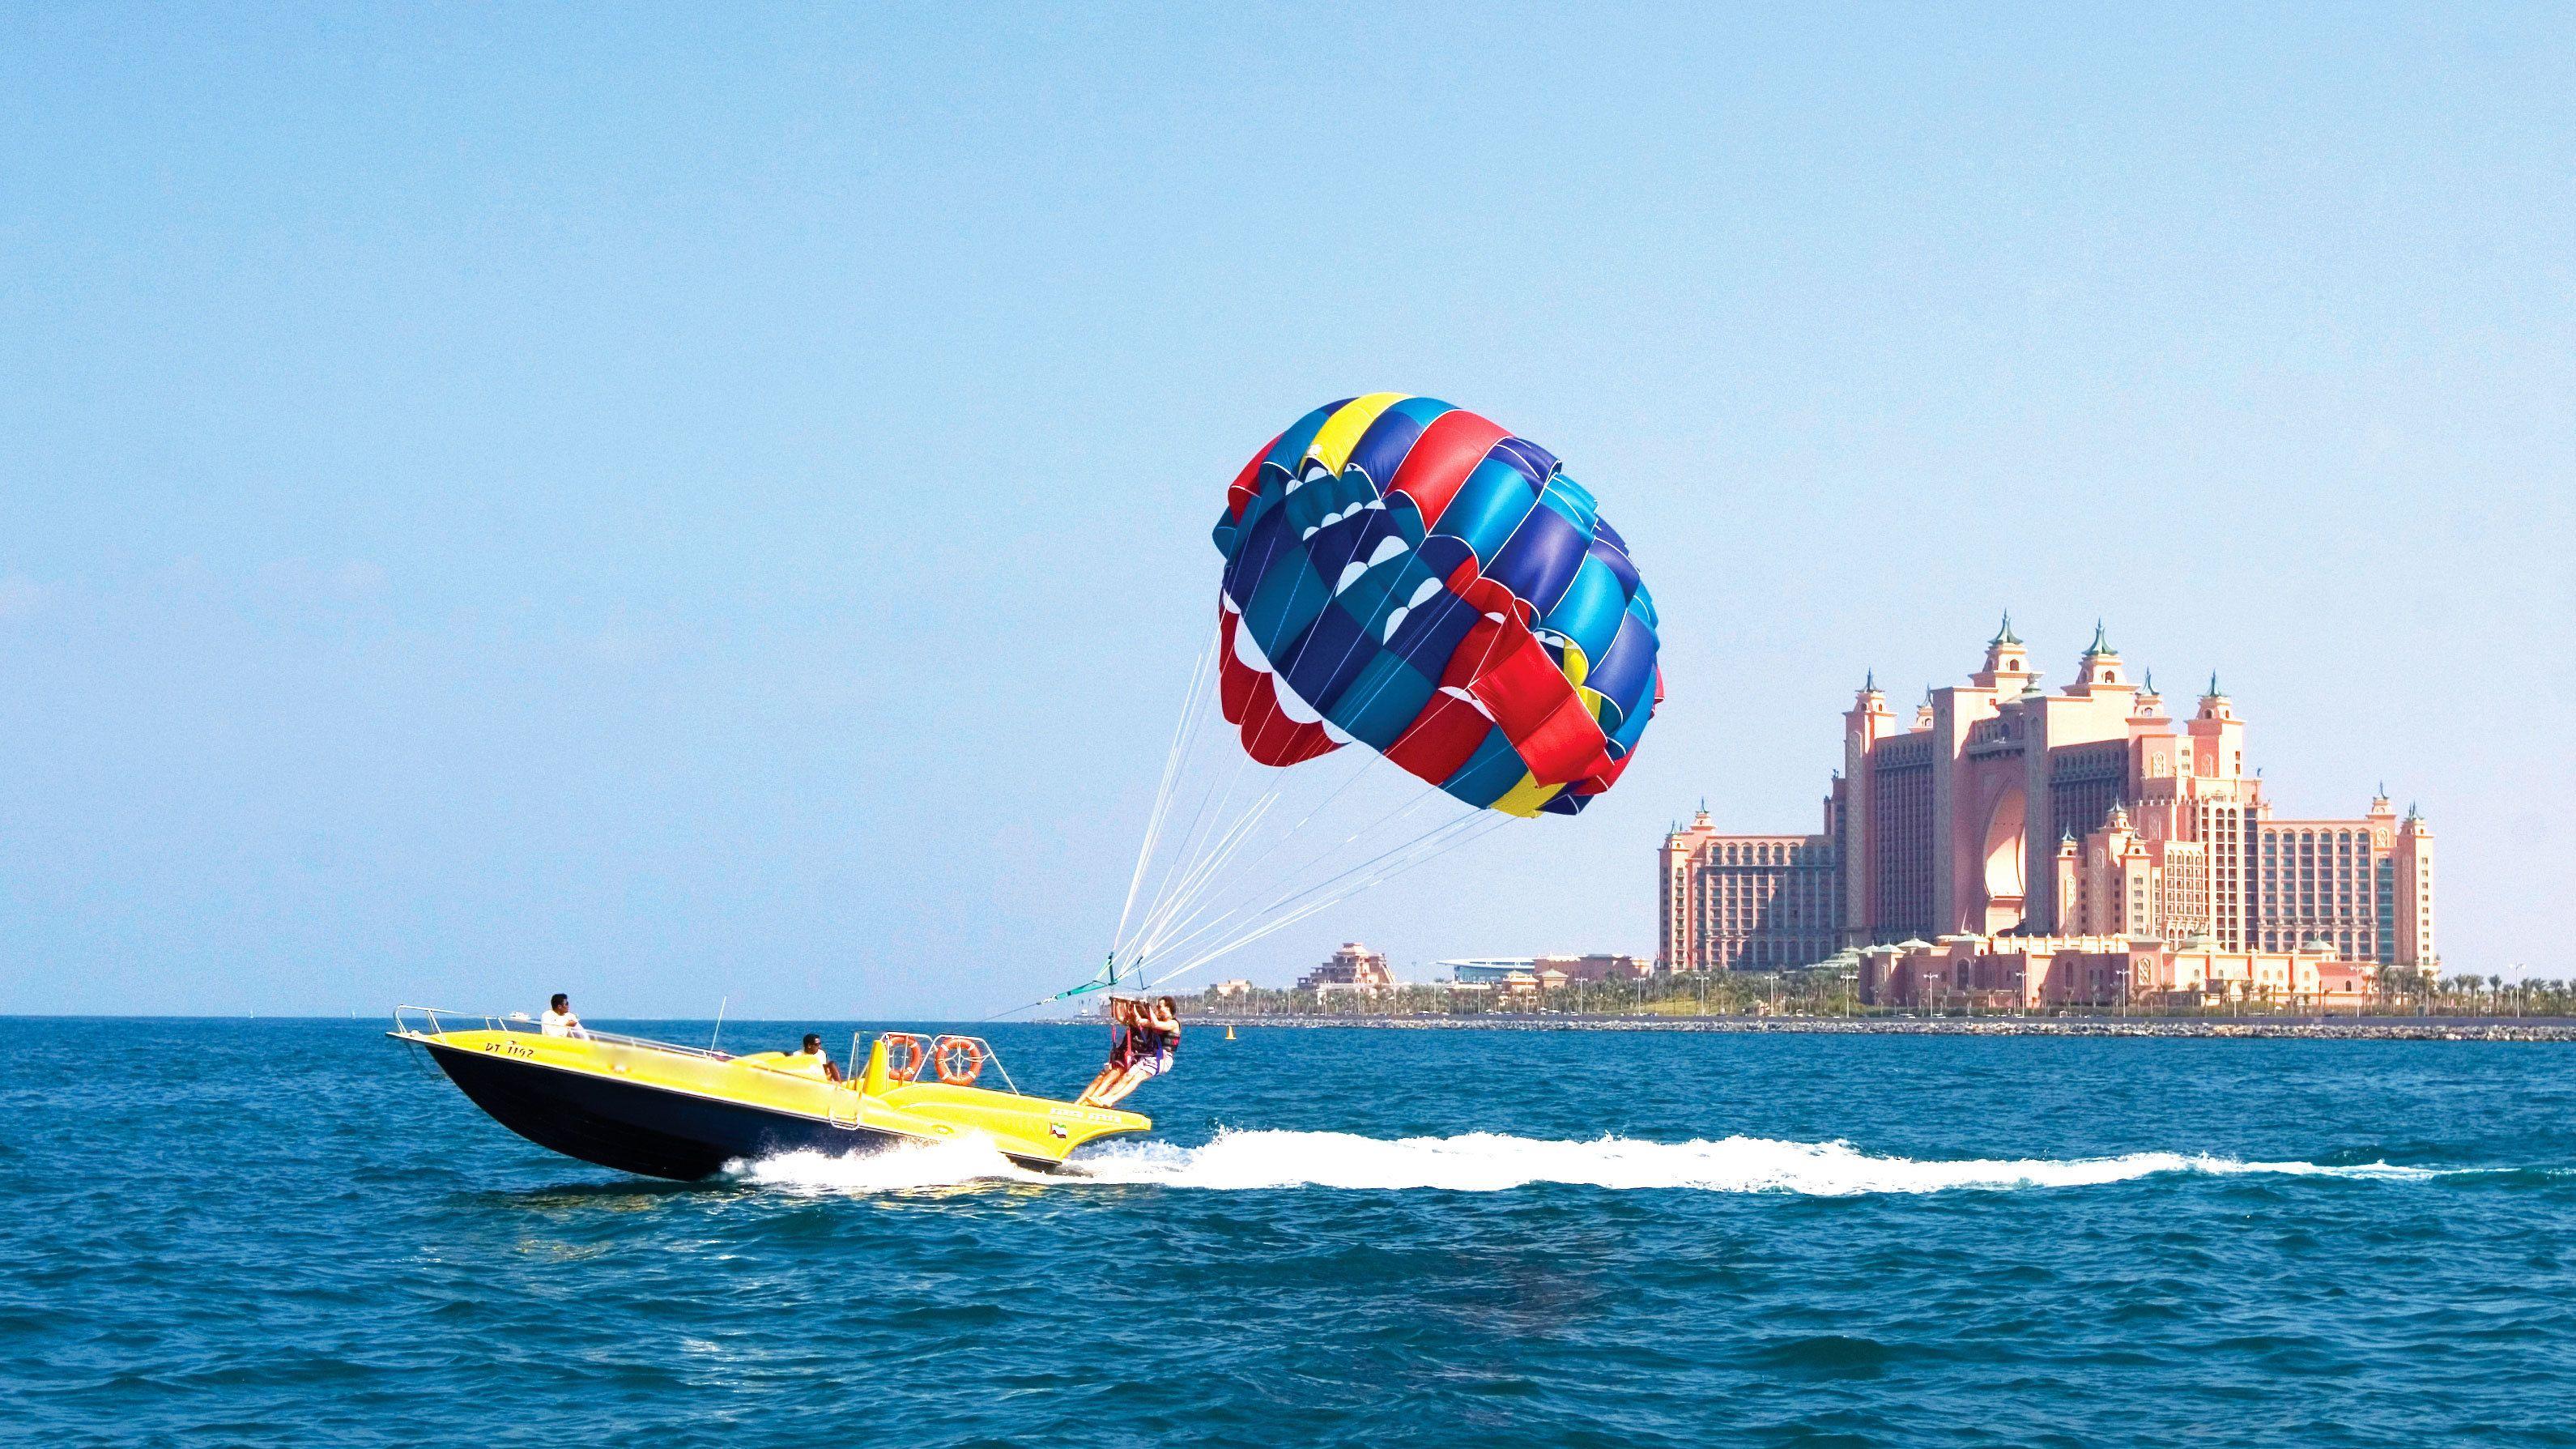 Jet boat with parasailers zipping past Atlantis Resort in Dubai